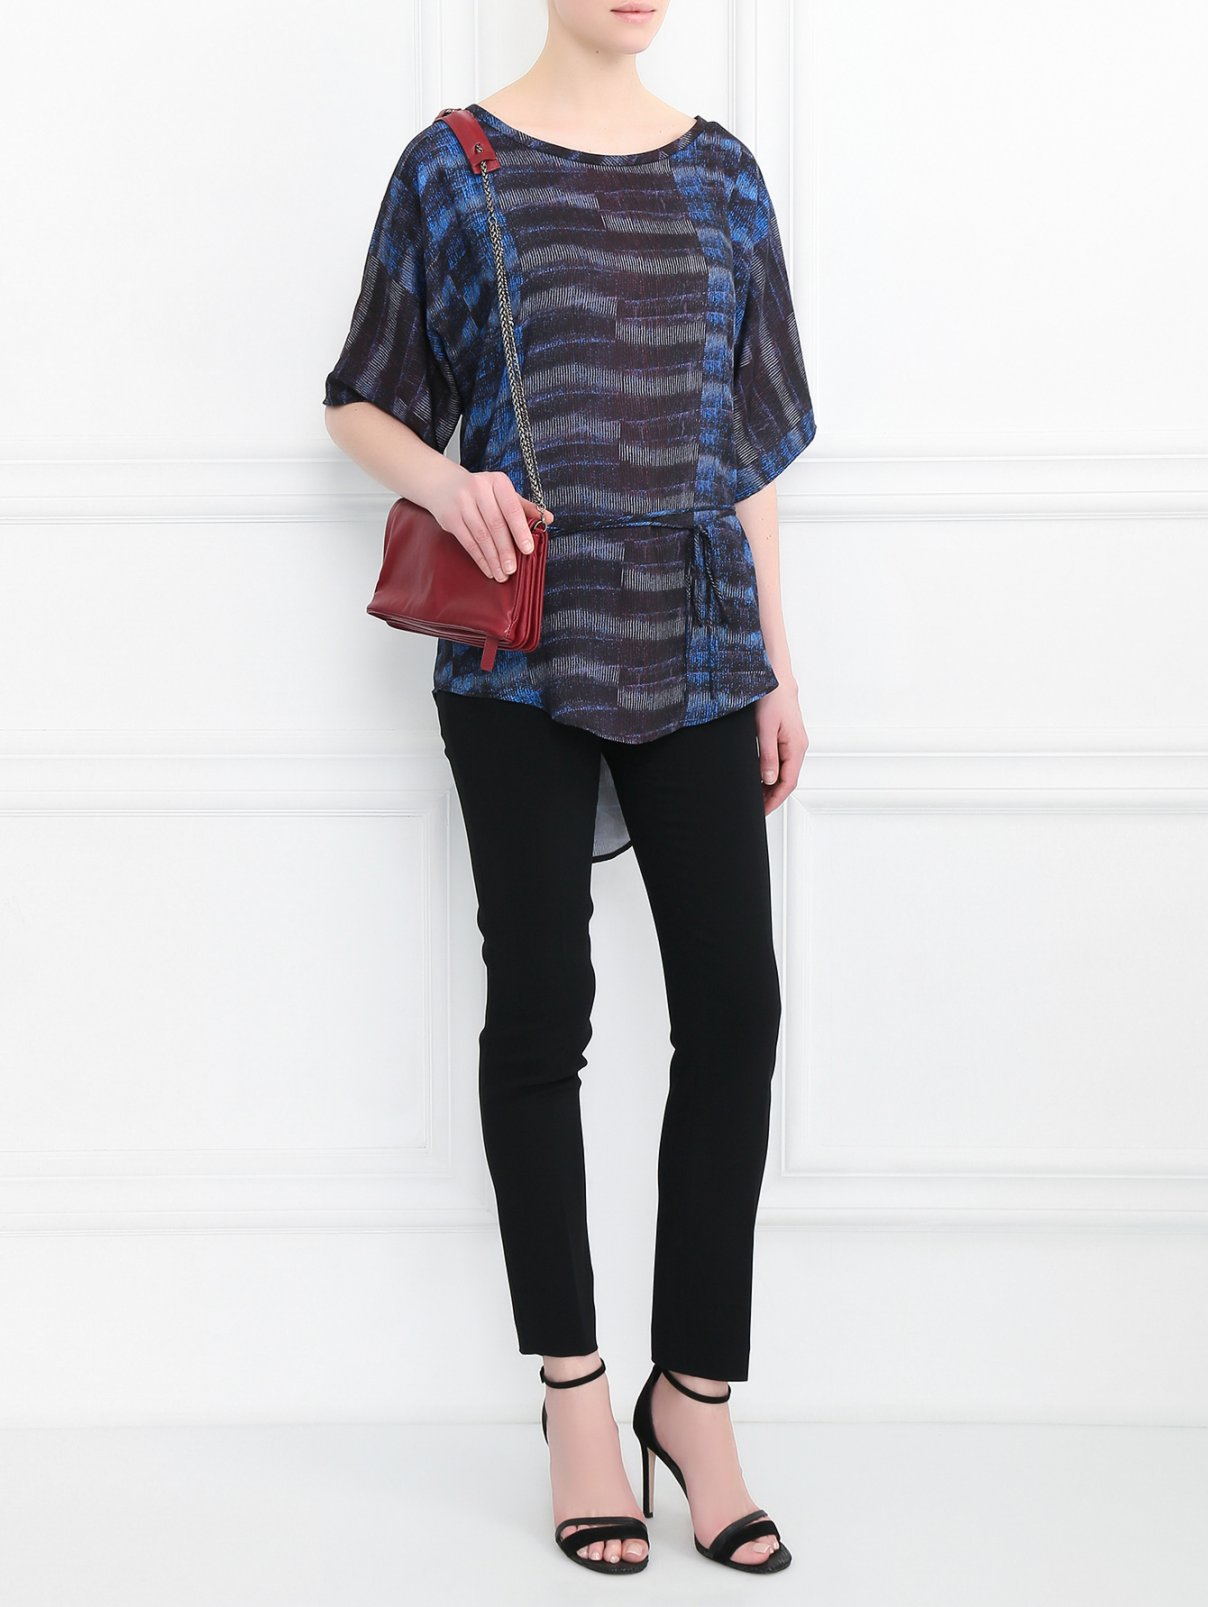 Блуза свободного кроя с узором See by Chloé  –  Модель Общий вид  – Цвет:  Узор